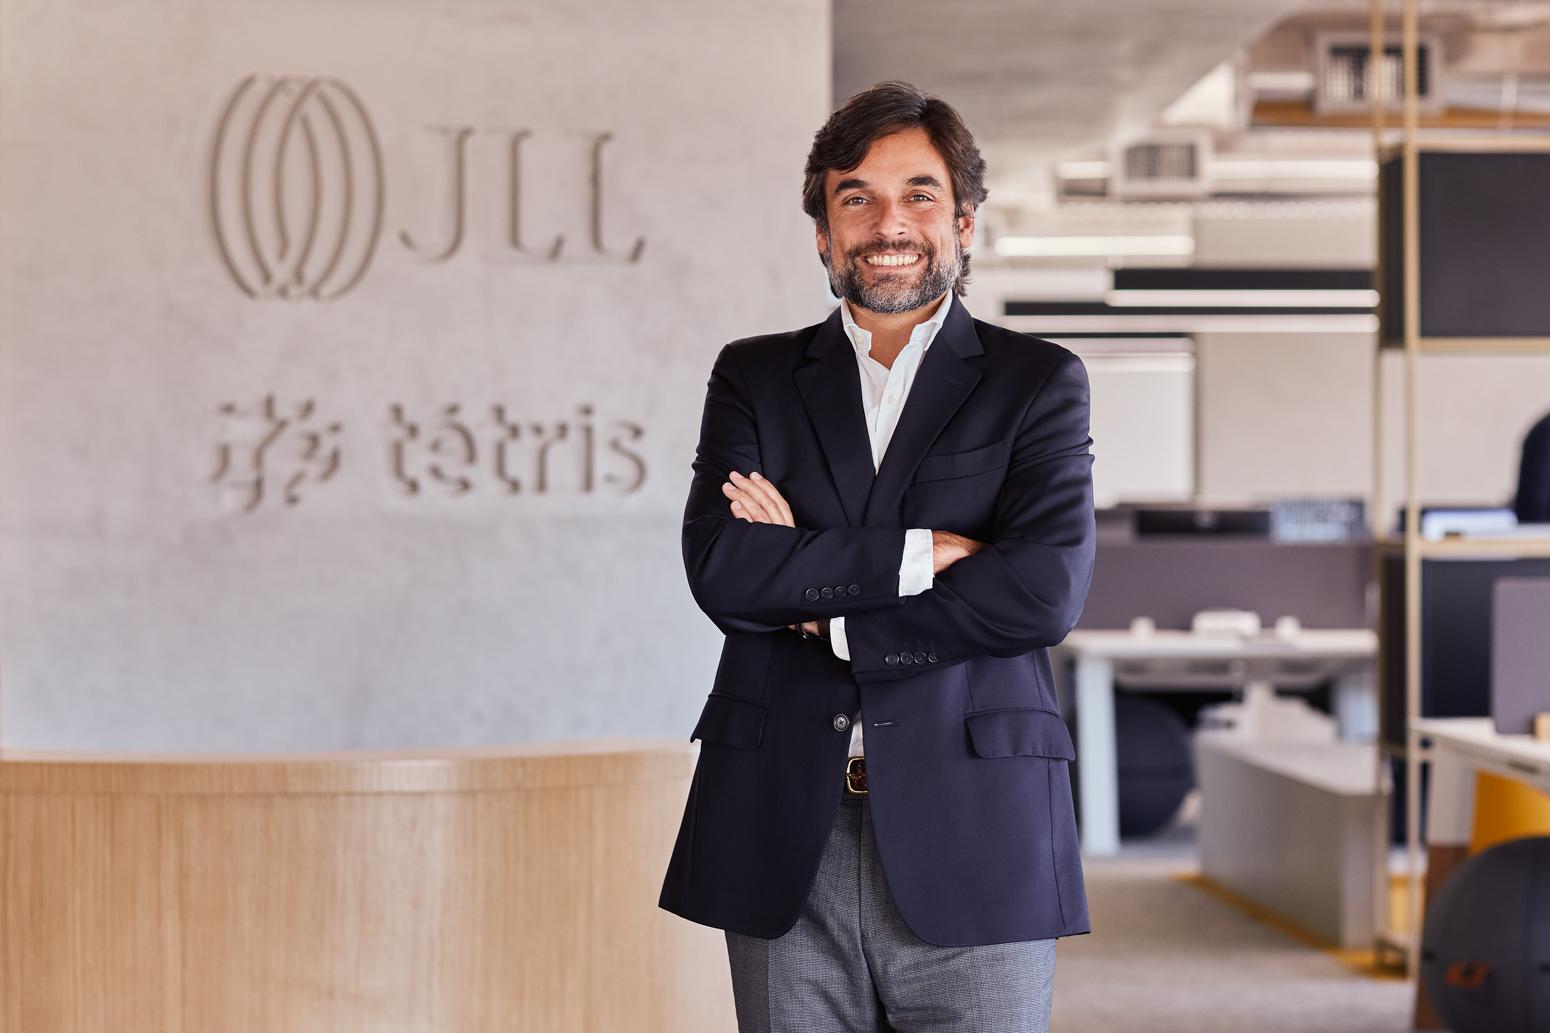 Carlos Cardoso, managing director da Tétris Portugal / Tétris